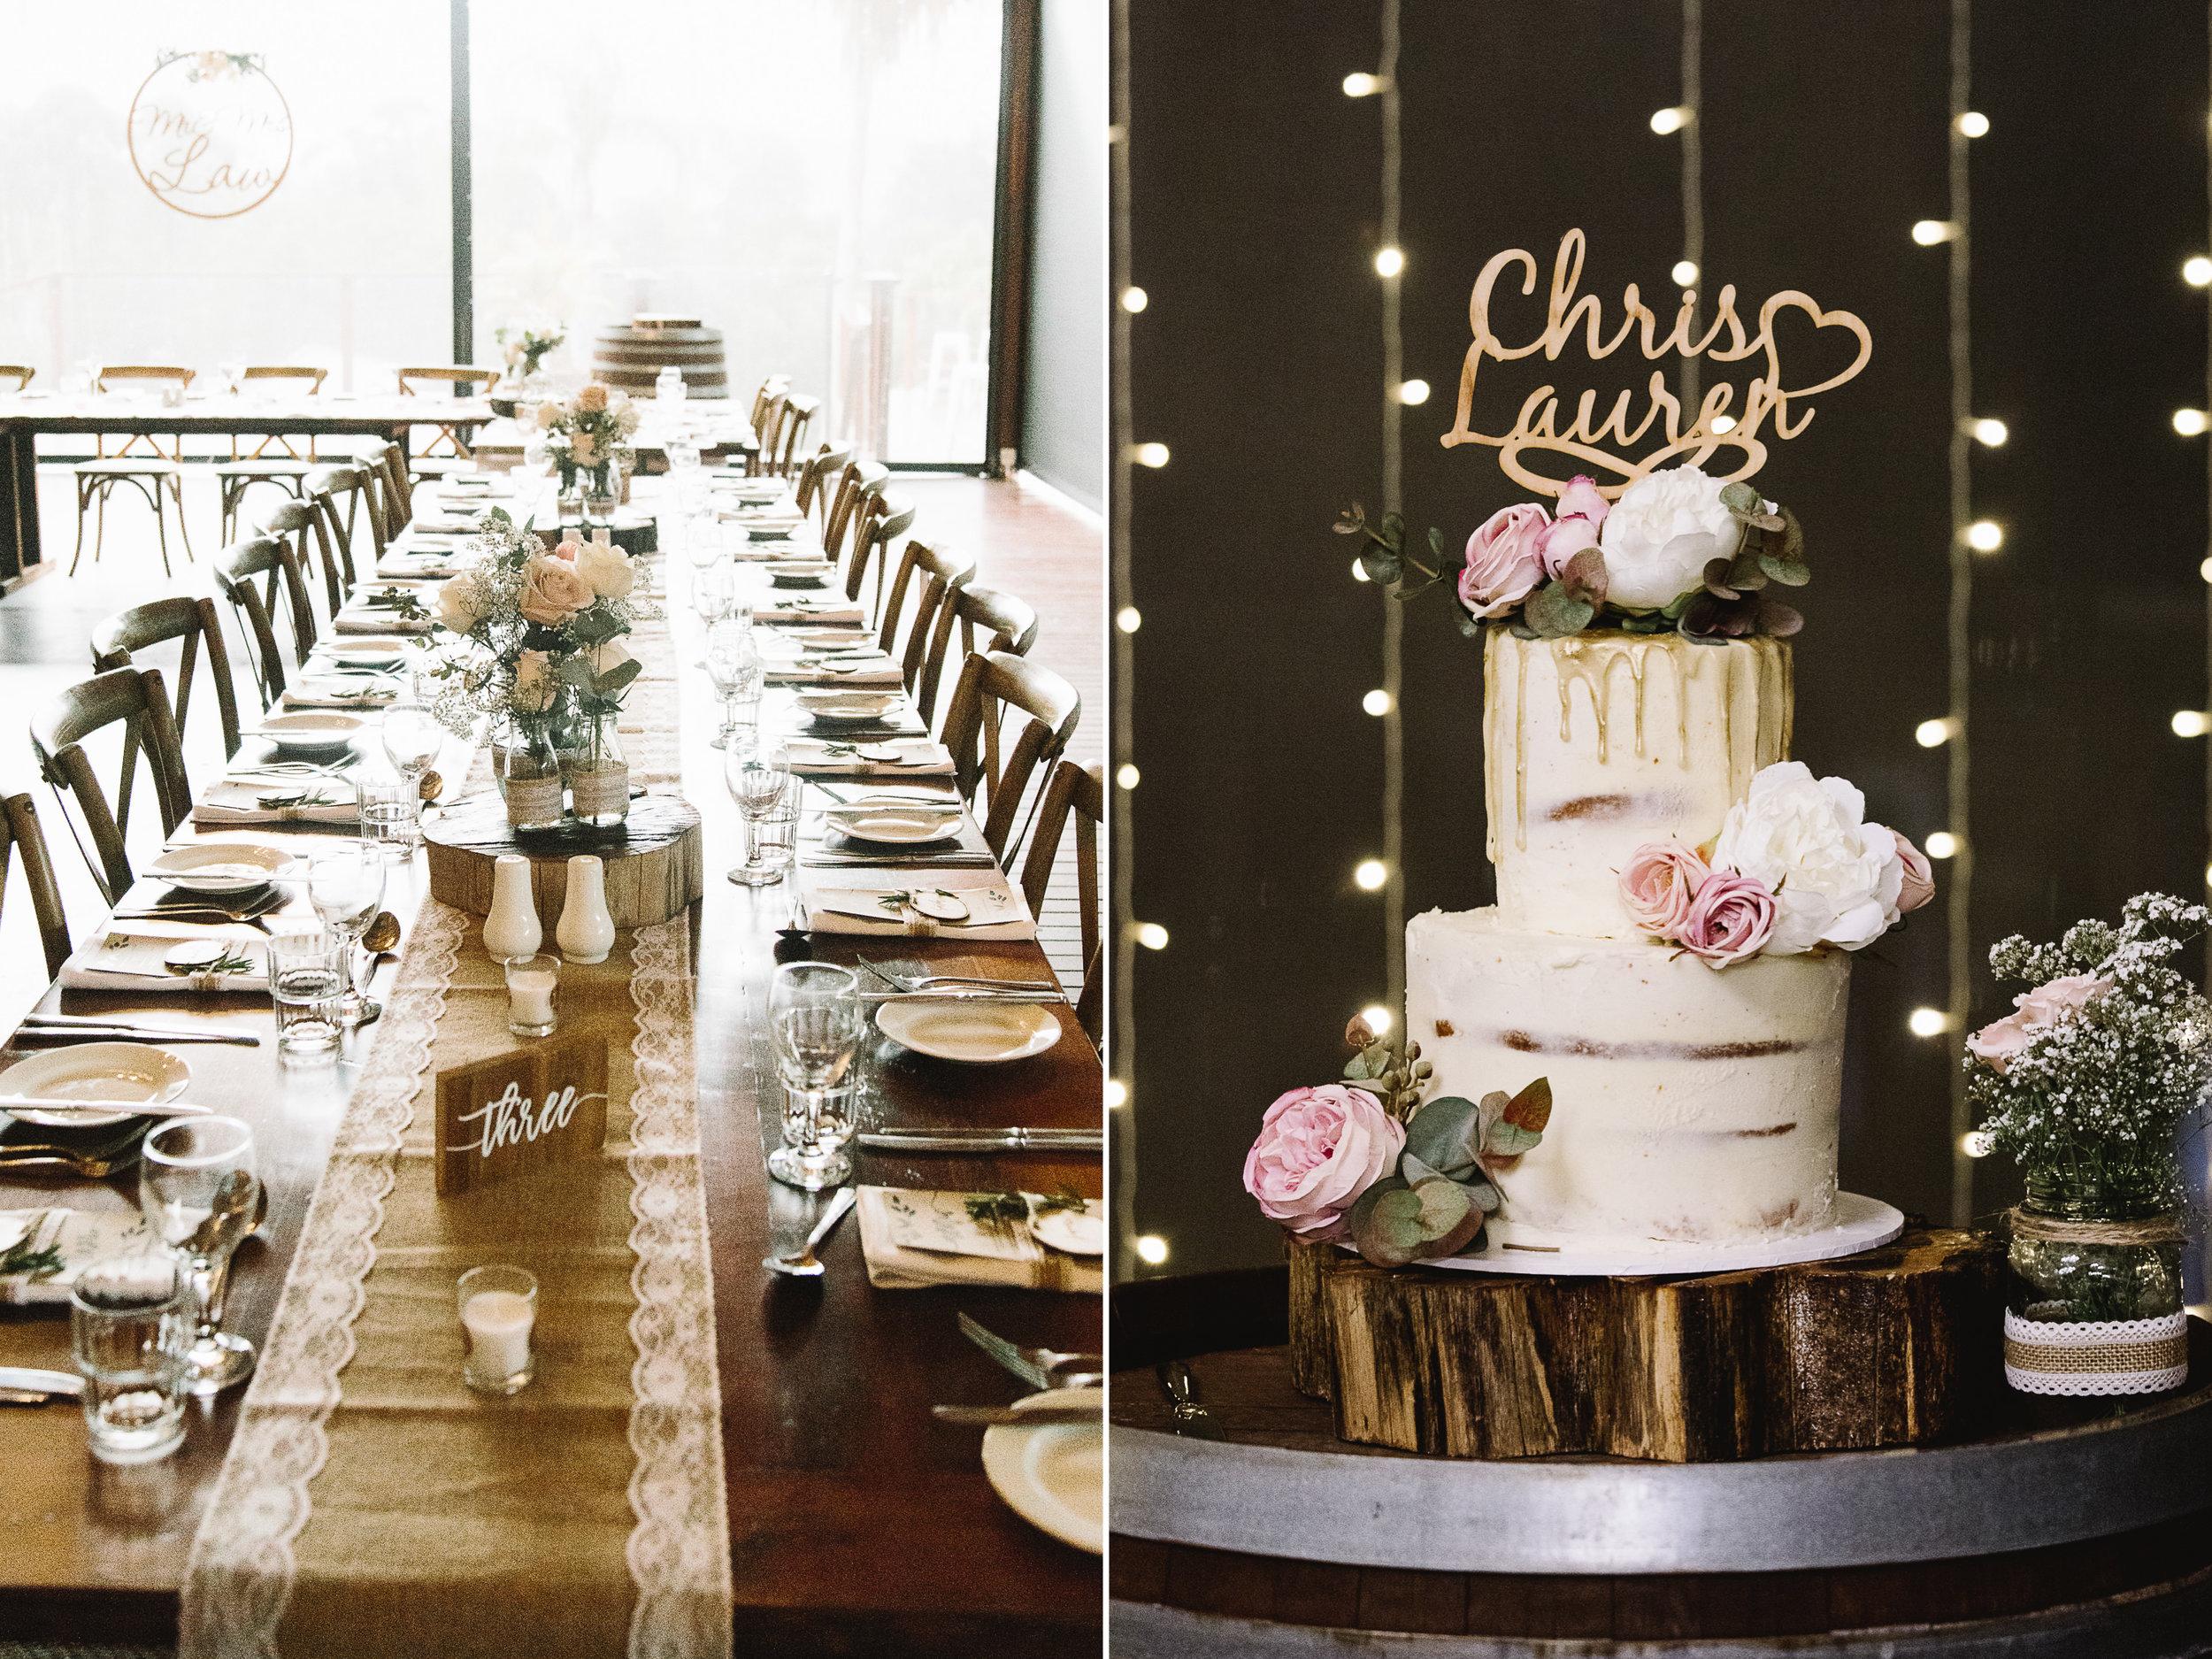 austinvilla-estate-wedding-reception-3.jpg